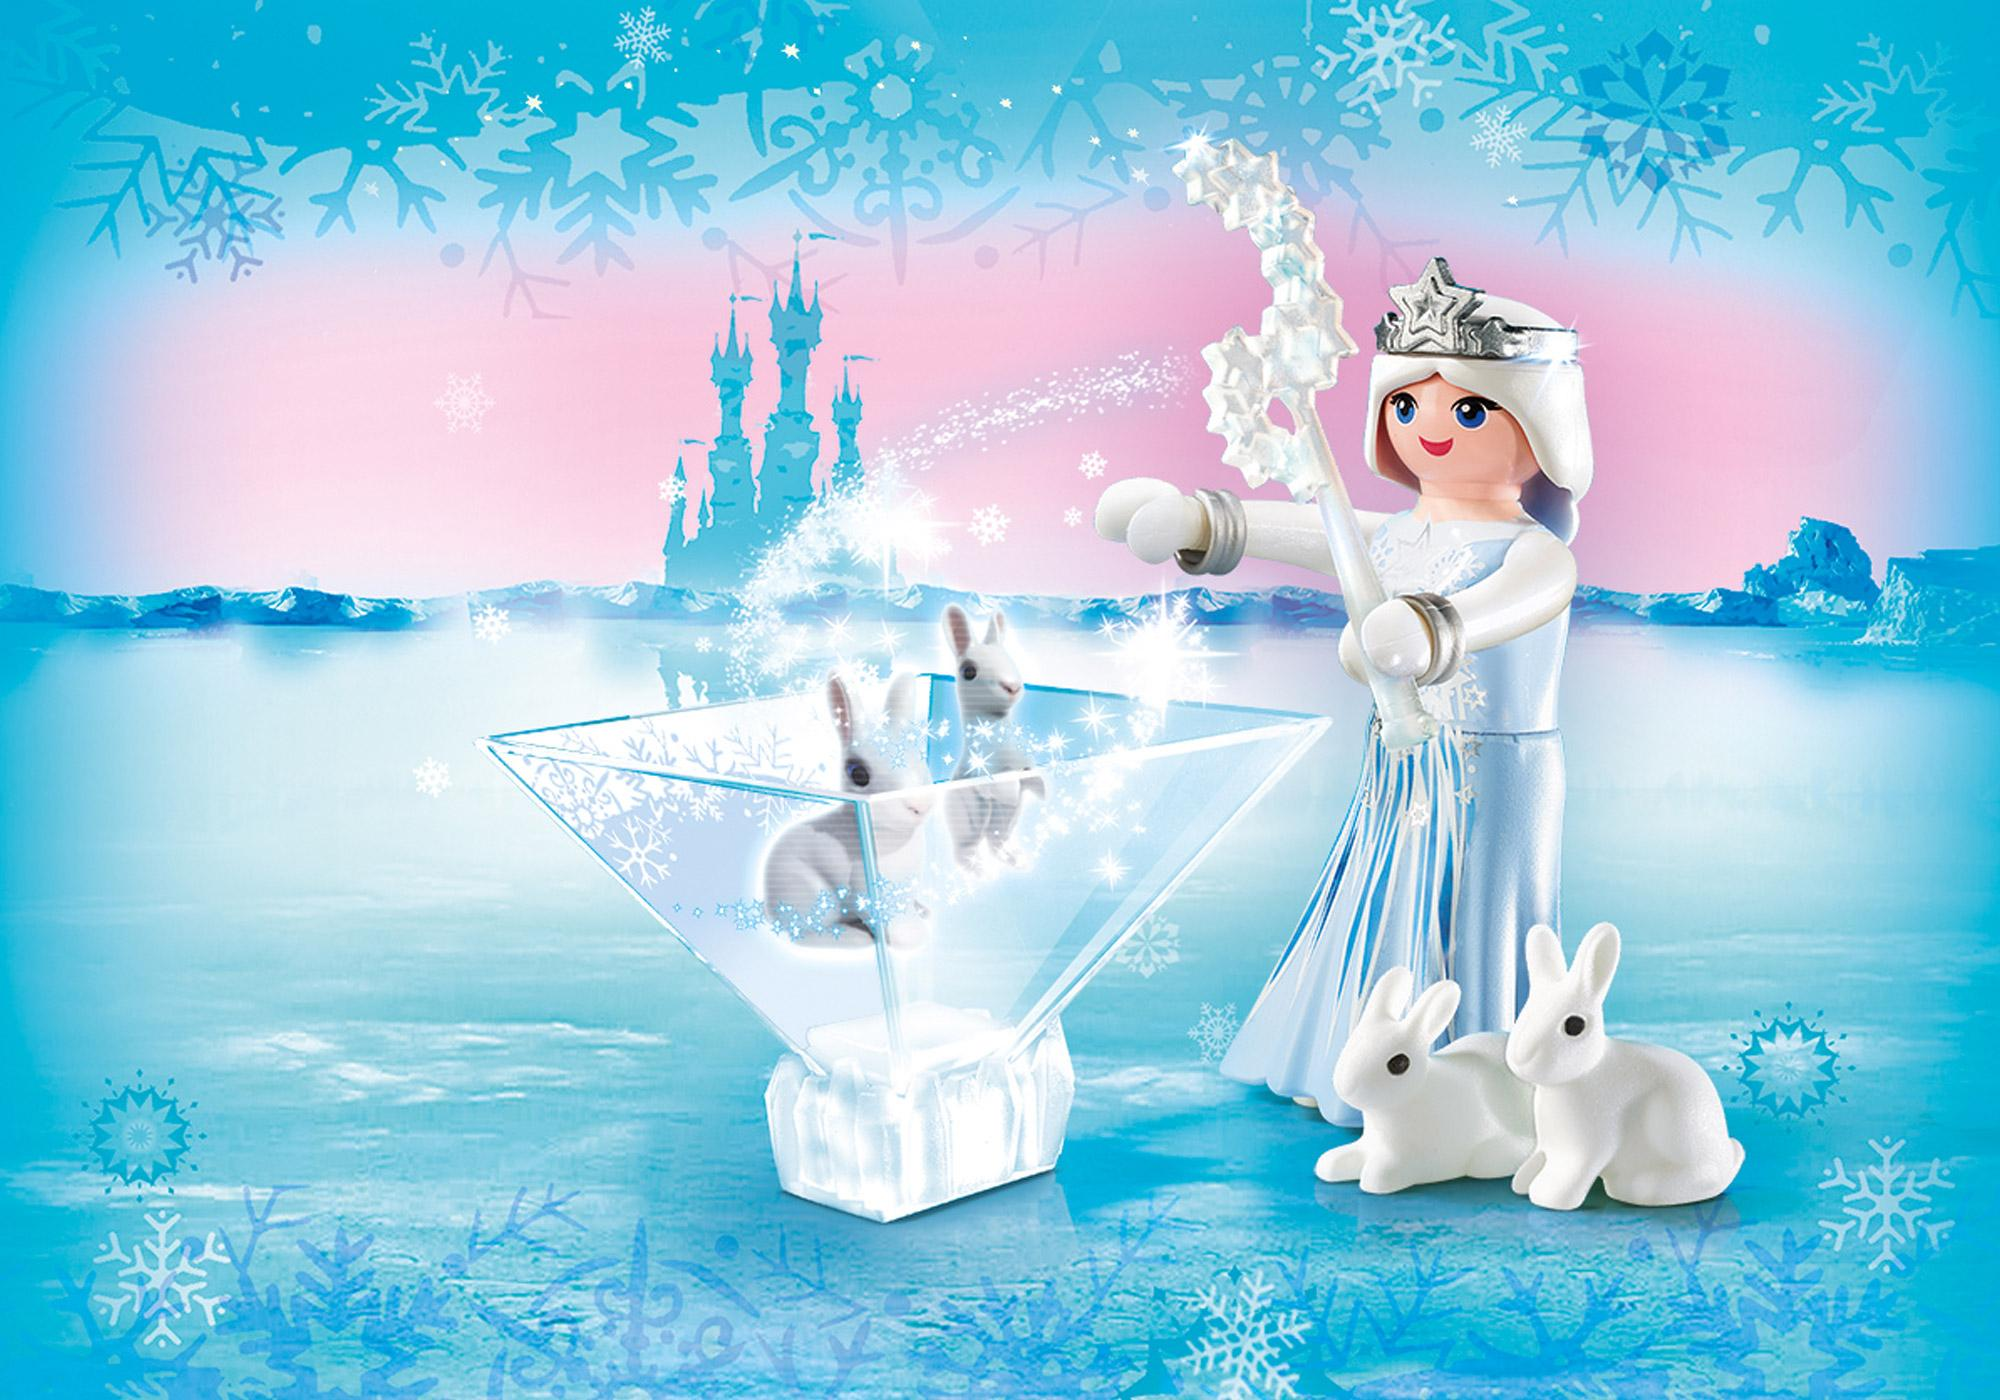 9352_product_detail/Πριγκίπισσα του χειμώνα με λαγουδάκια